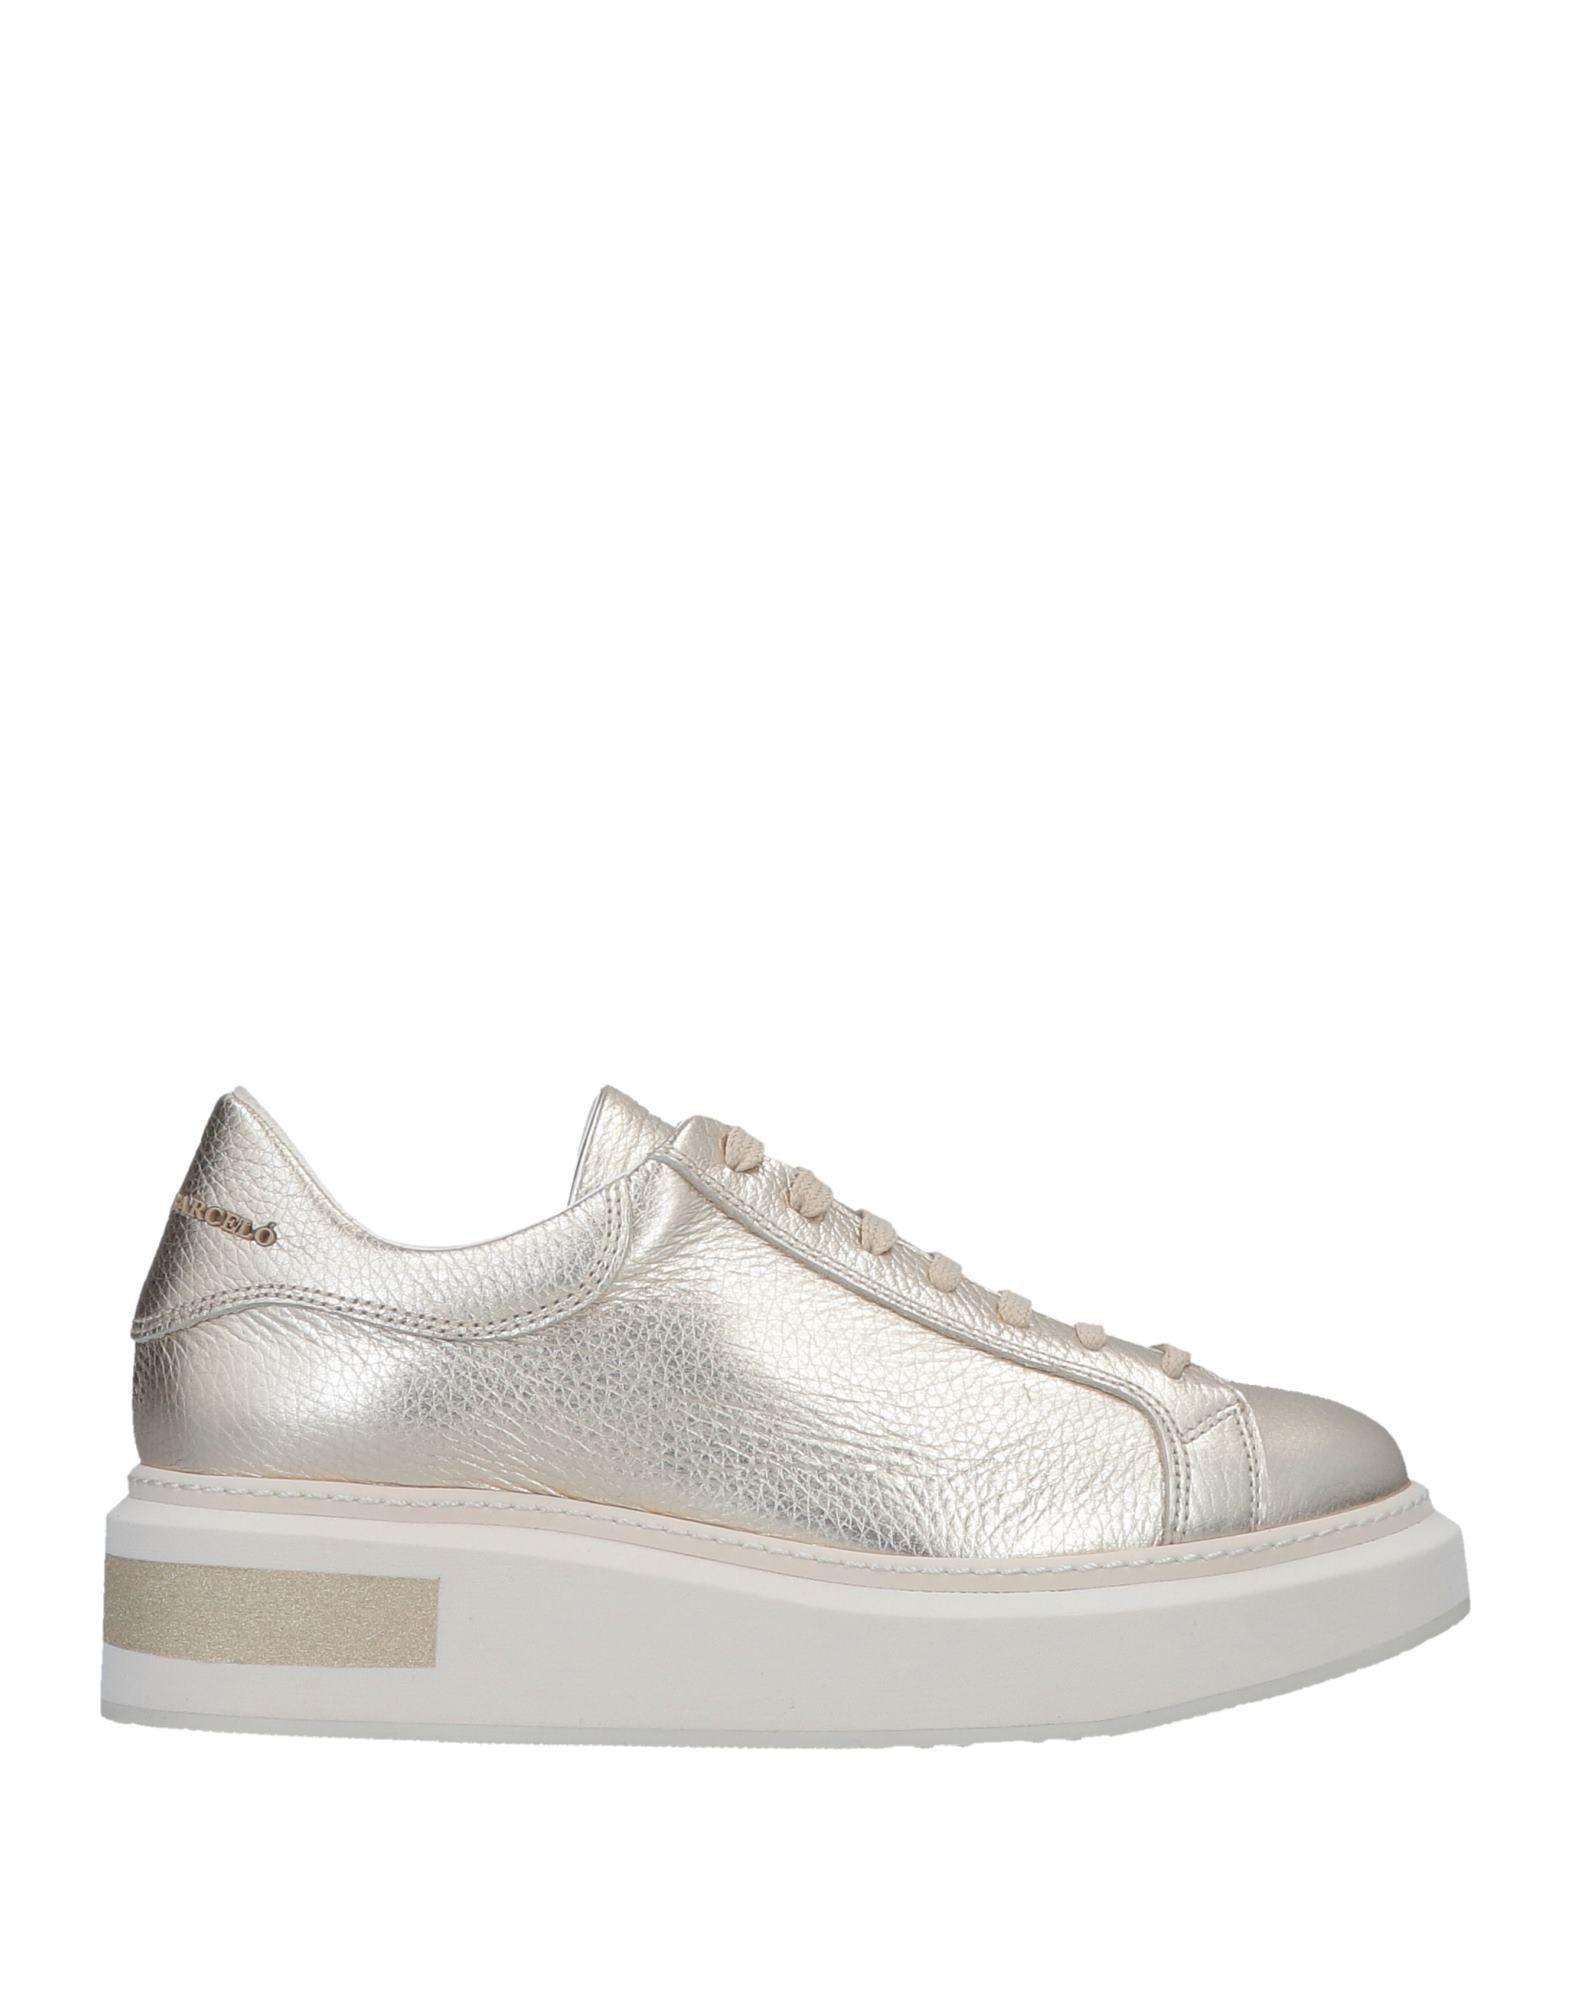 Stilvolle Sneakers billige Schuhe Manuel Barceló Sneakers Stilvolle Damen  11511586MH 07ea15